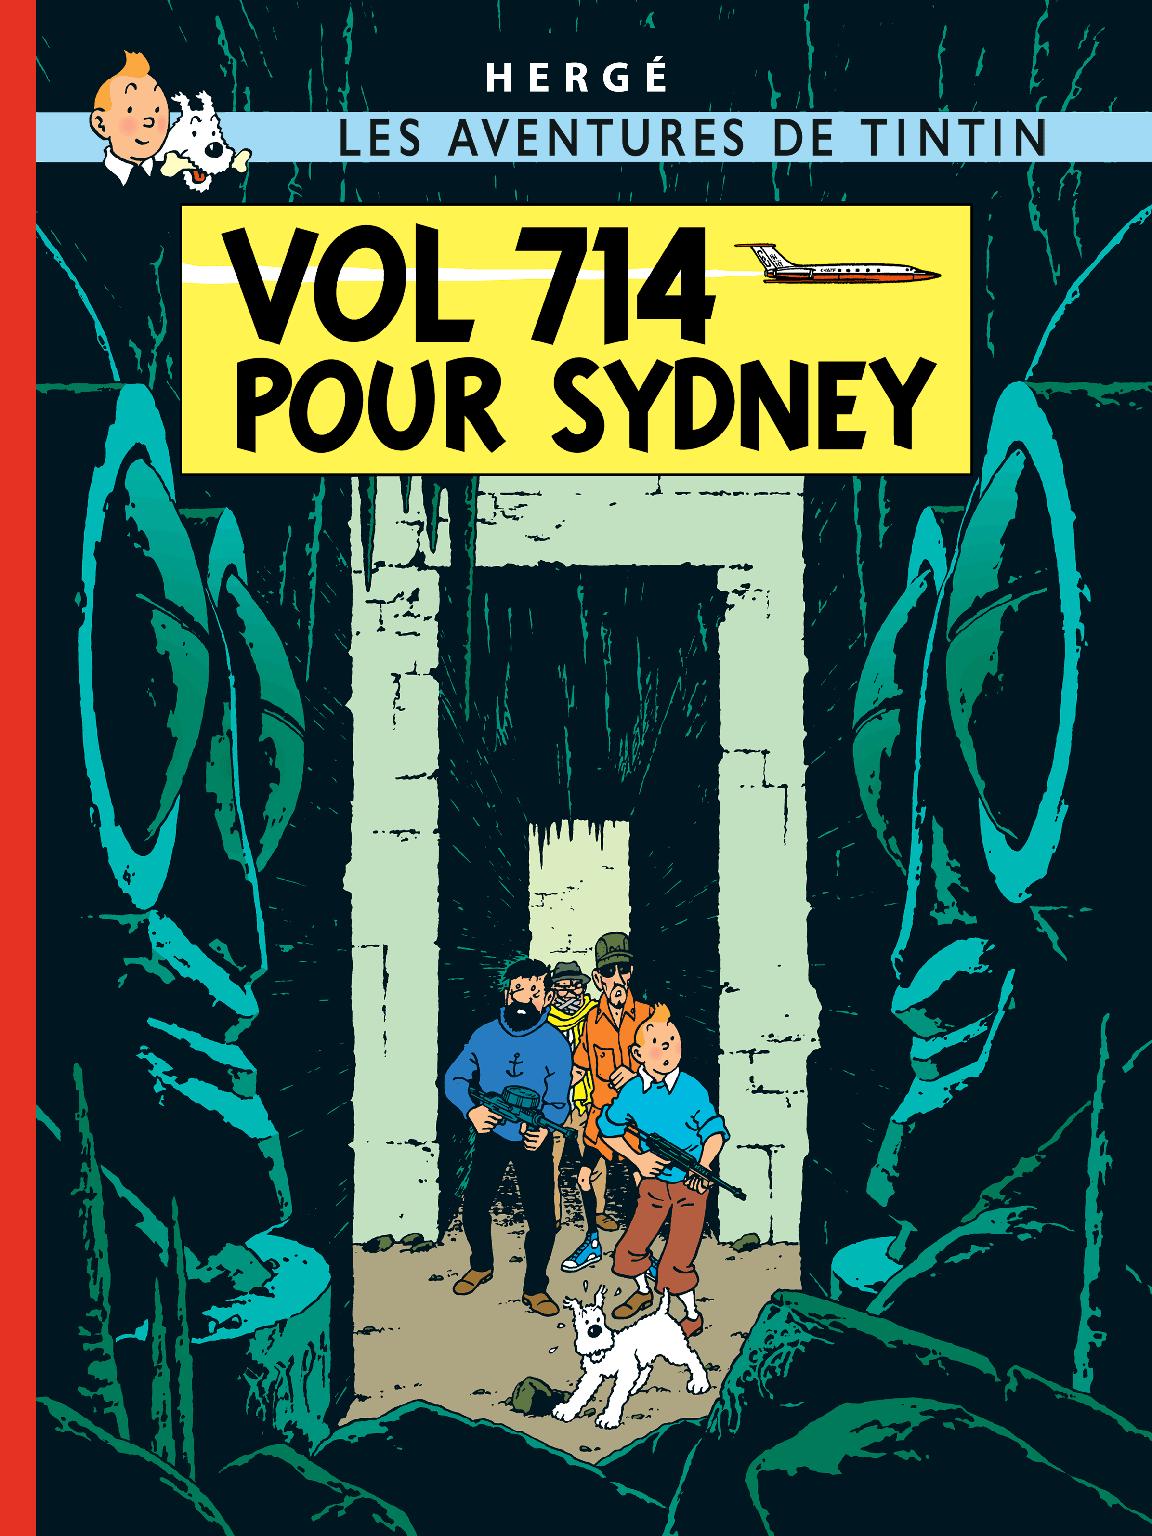 TINTIN Flight 714 Sydney Hergé RG tintin.com